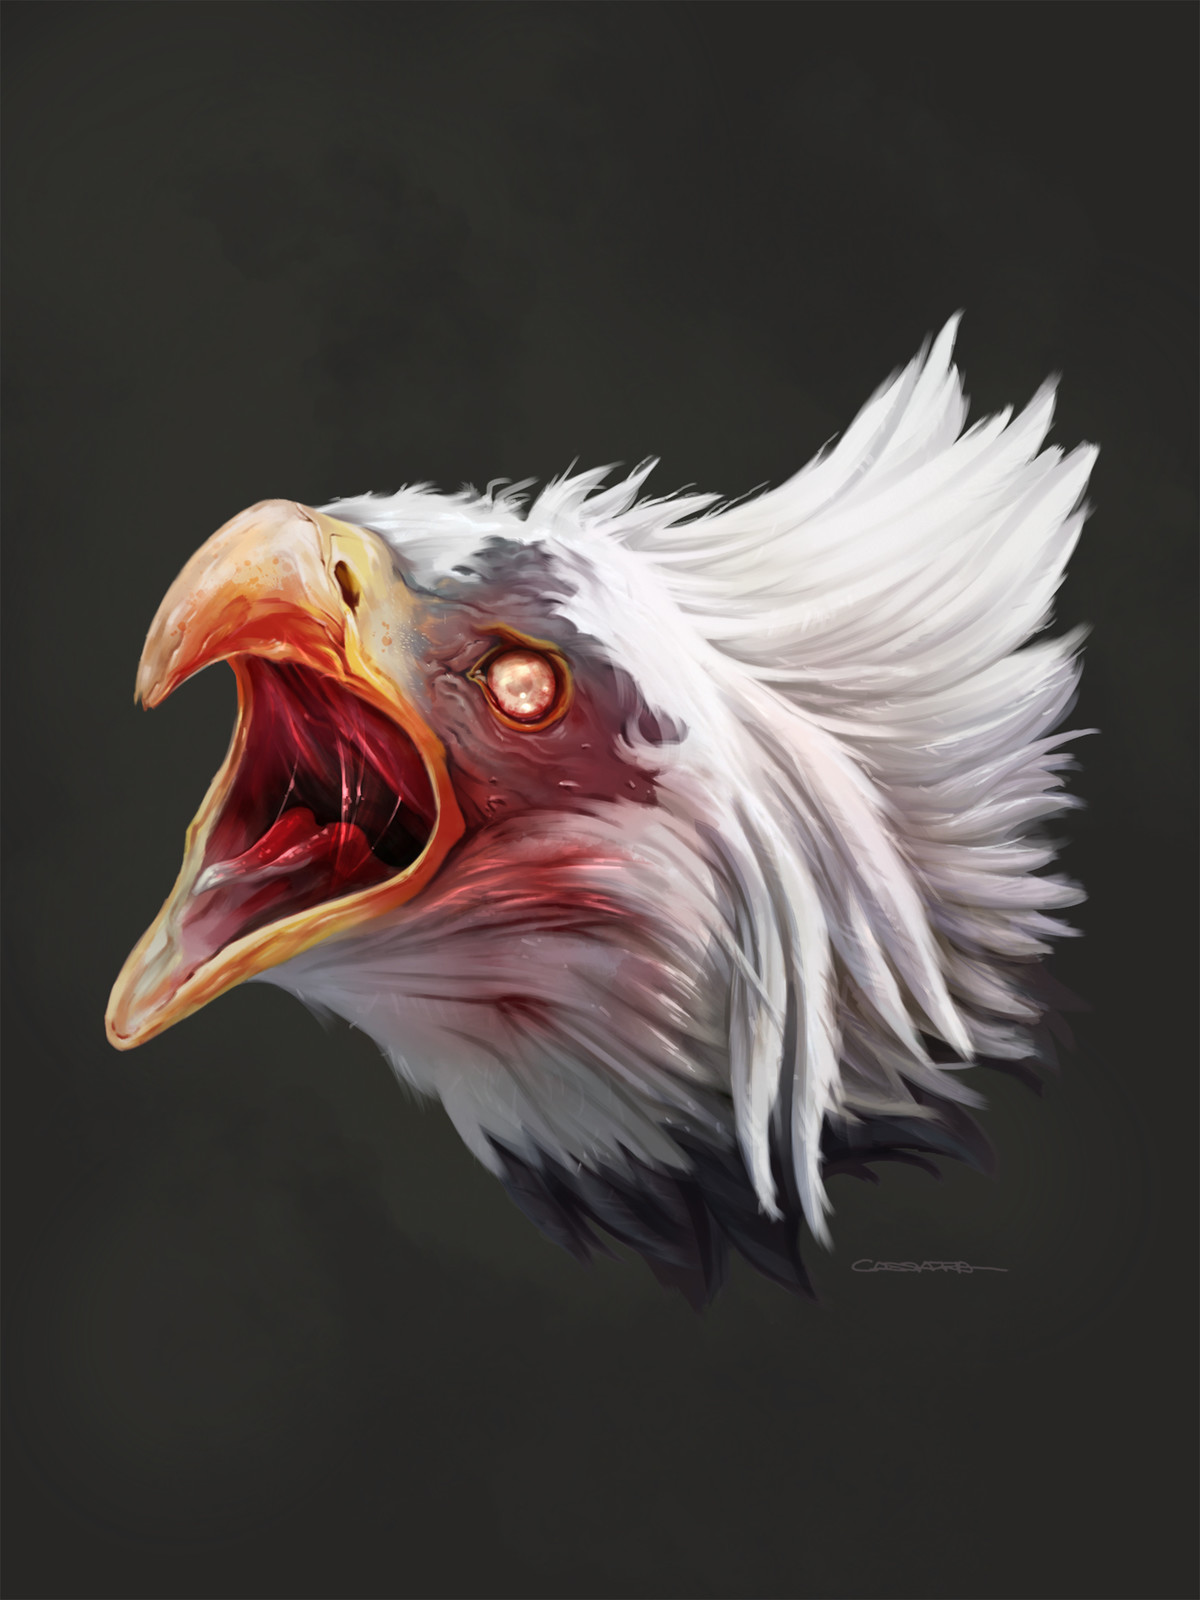 Zomb-Eagle